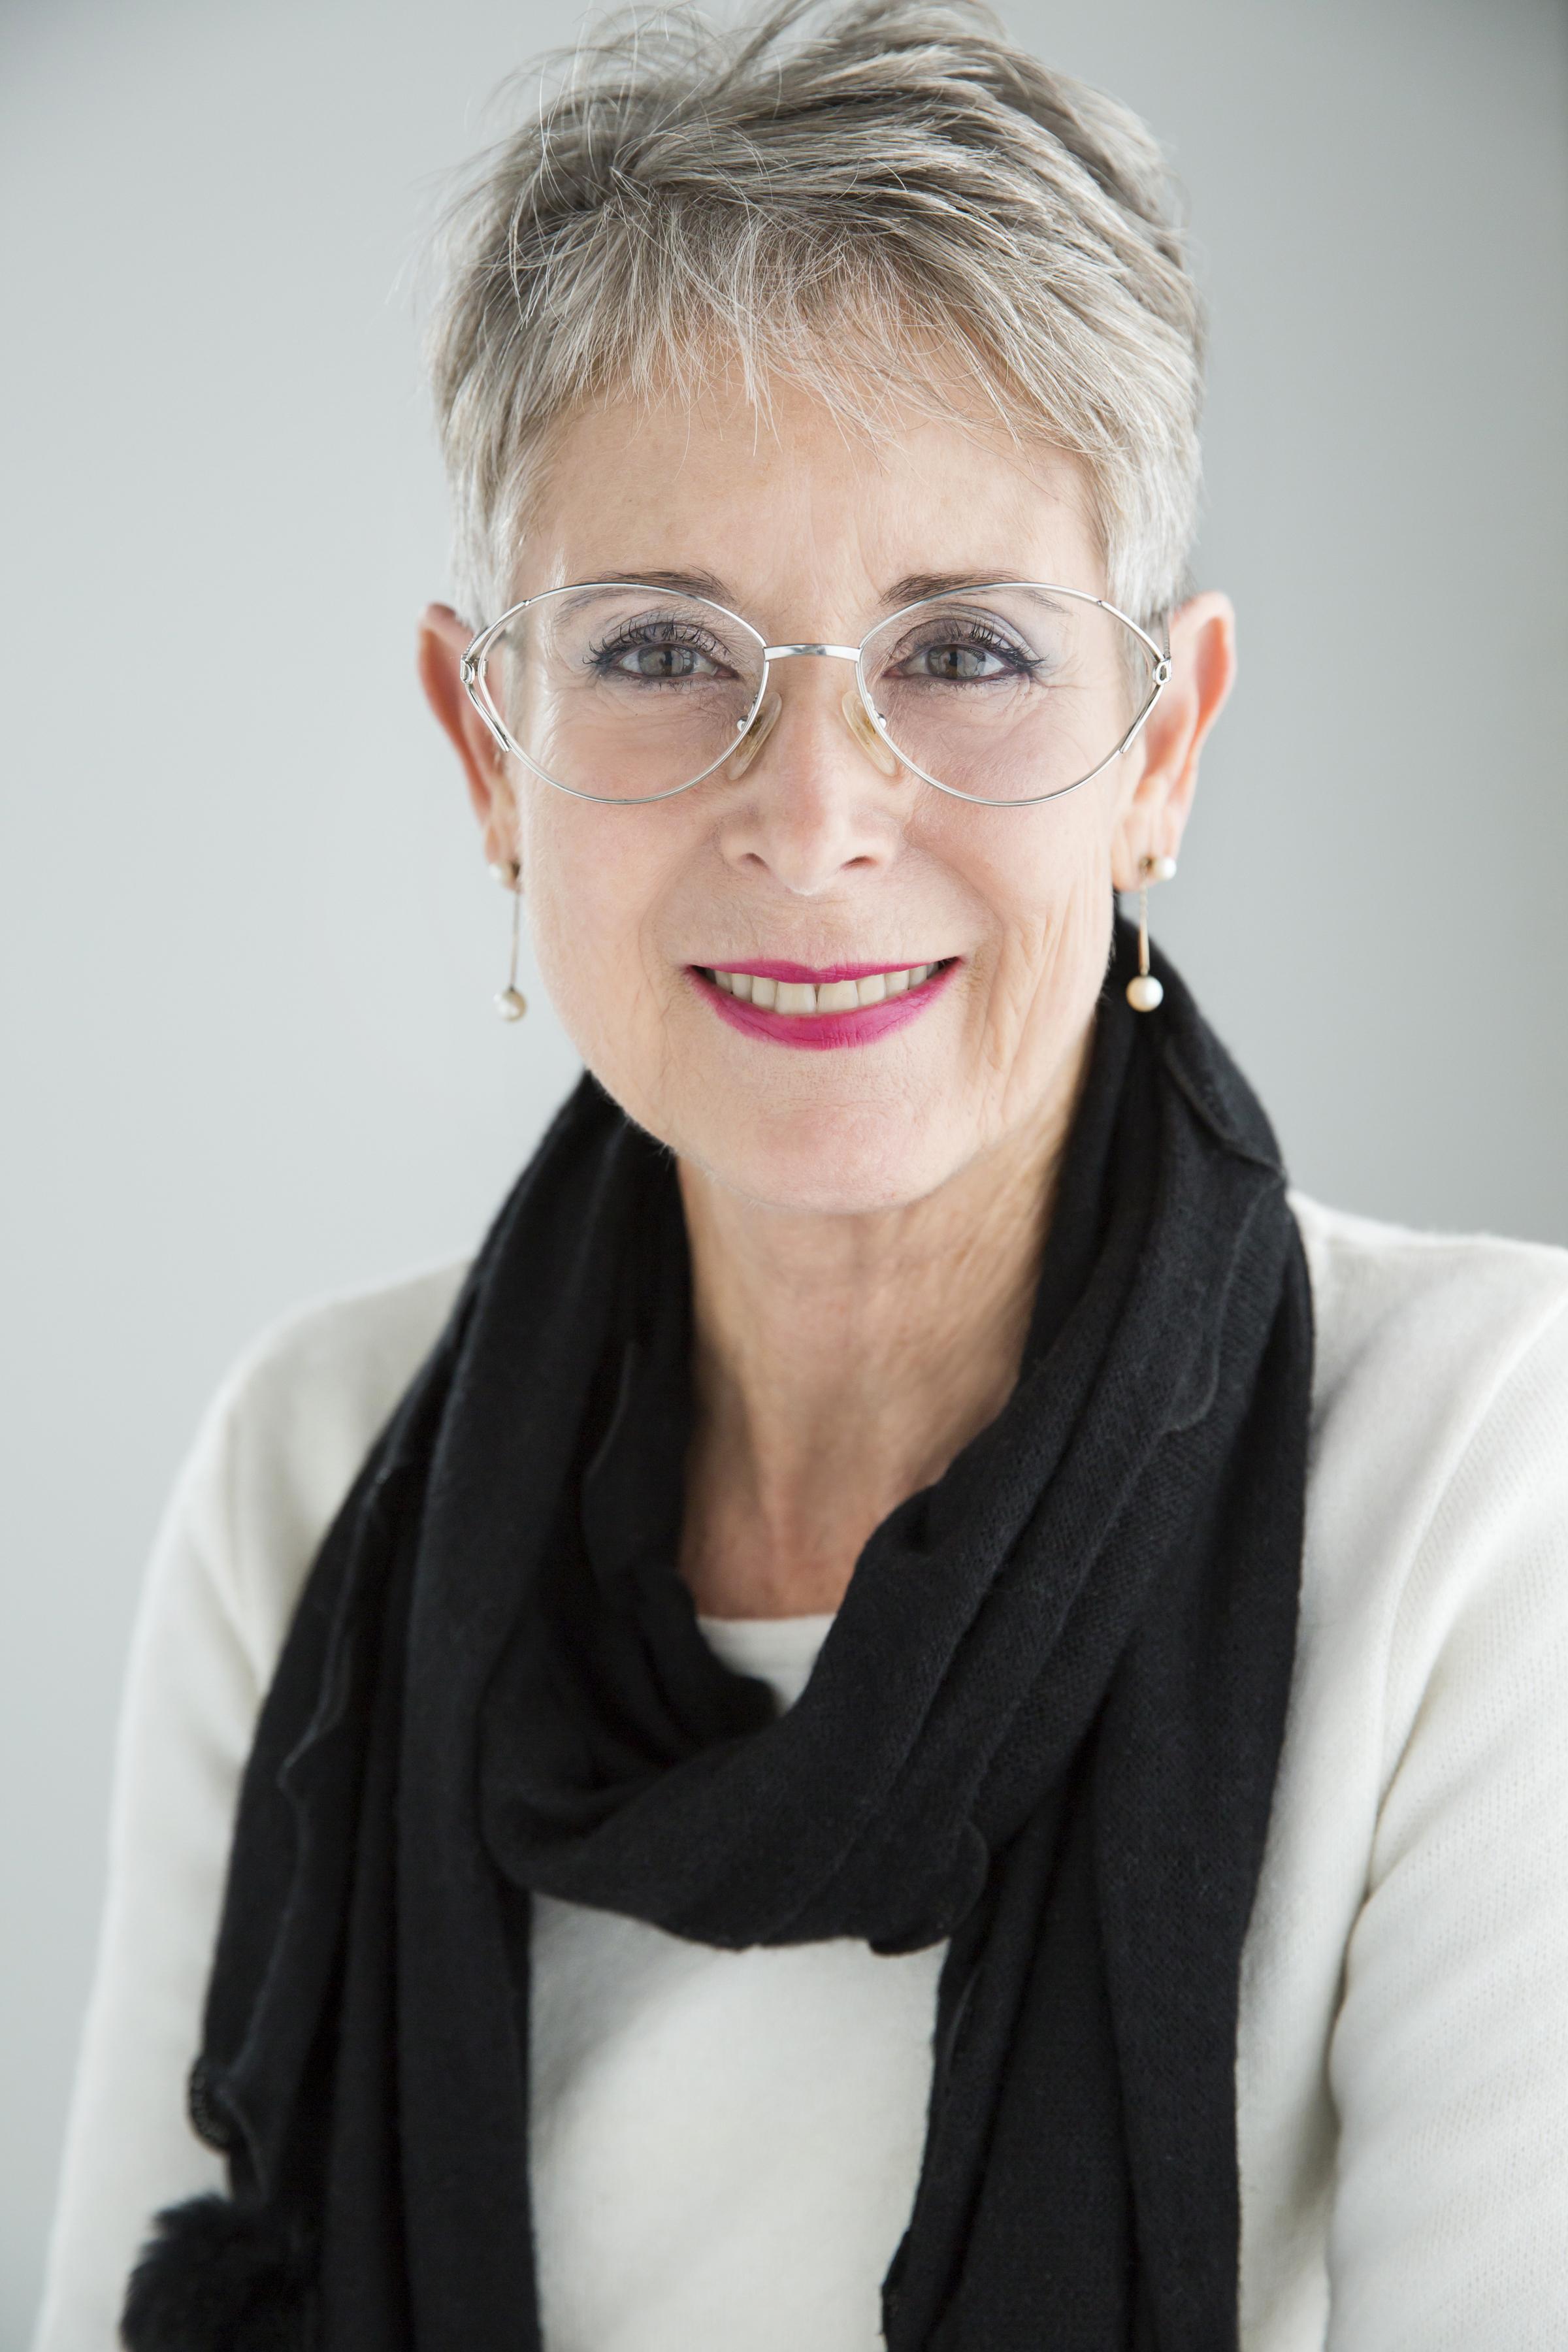 Vivienne James